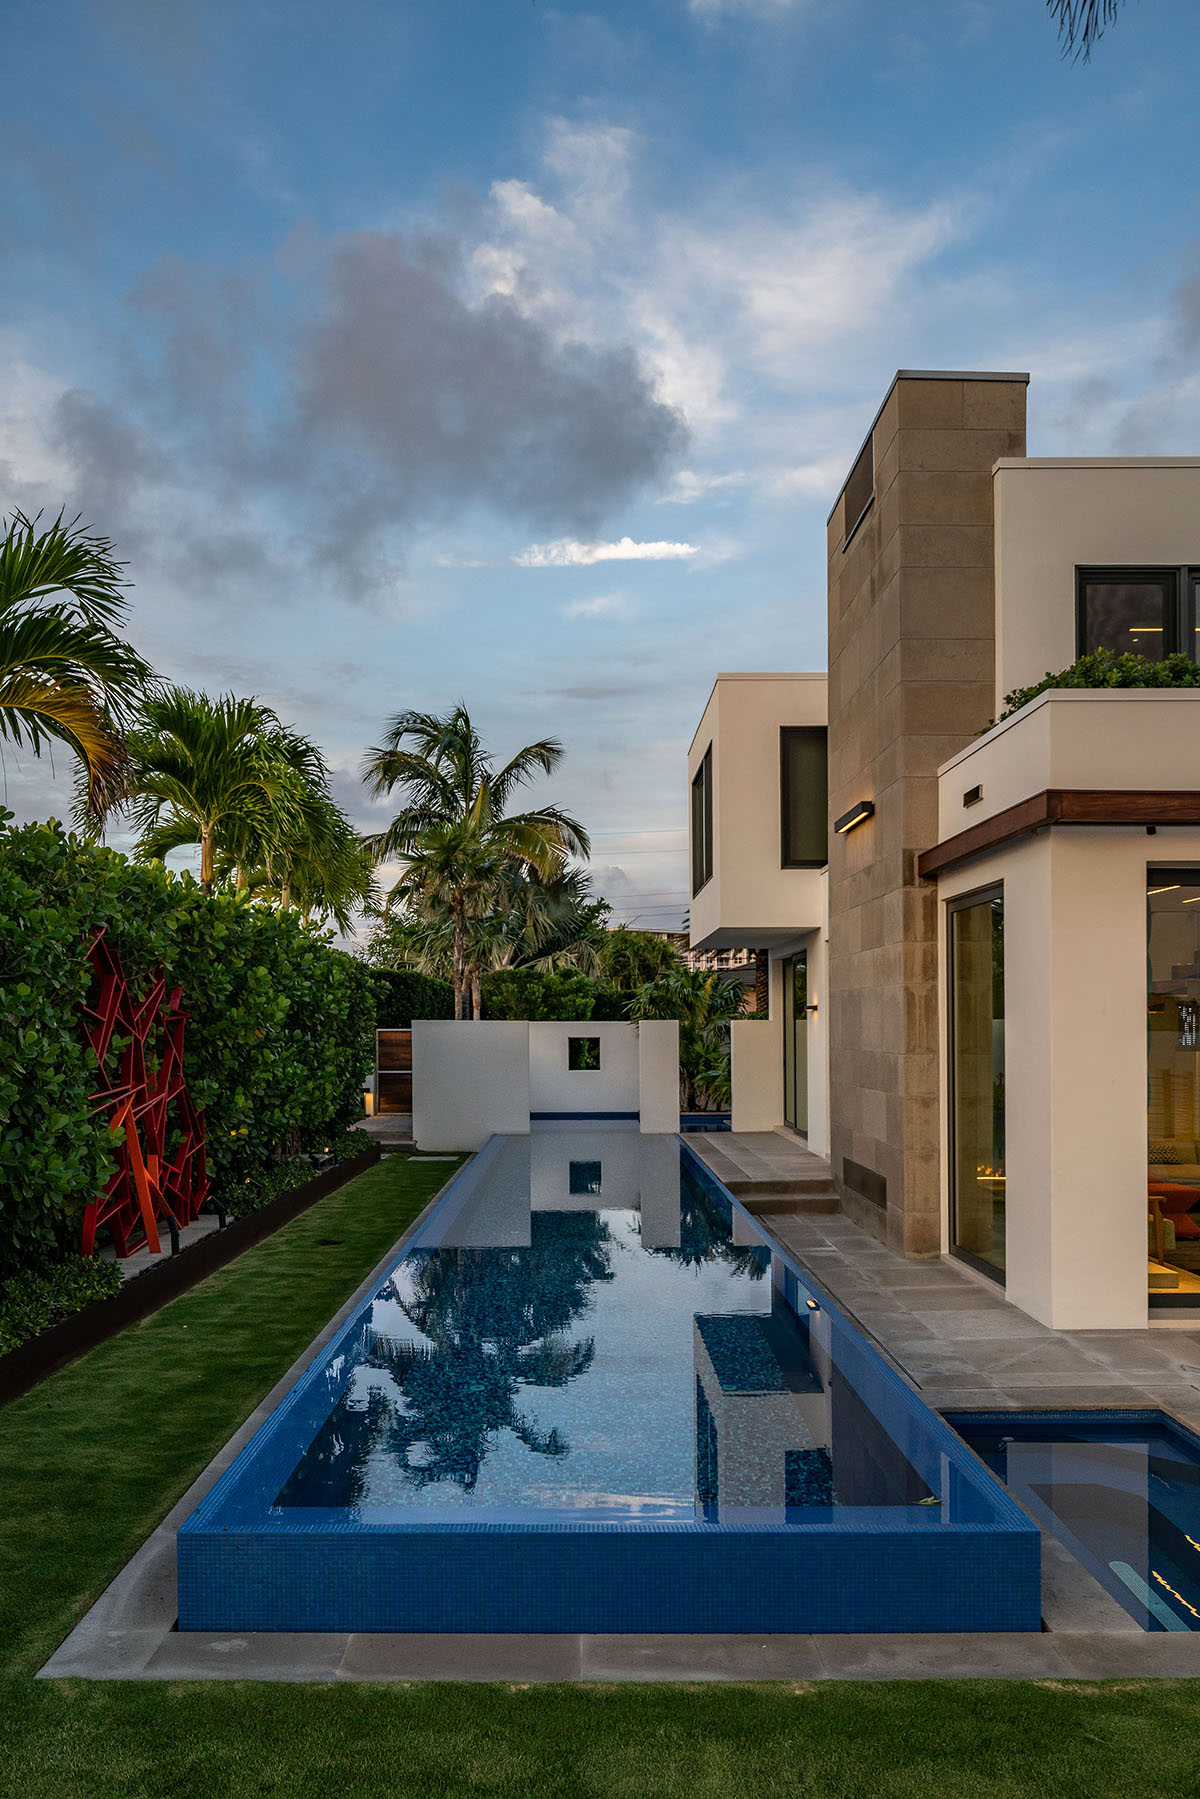 Pool in backyard of Palm Beach Luxury Design Project